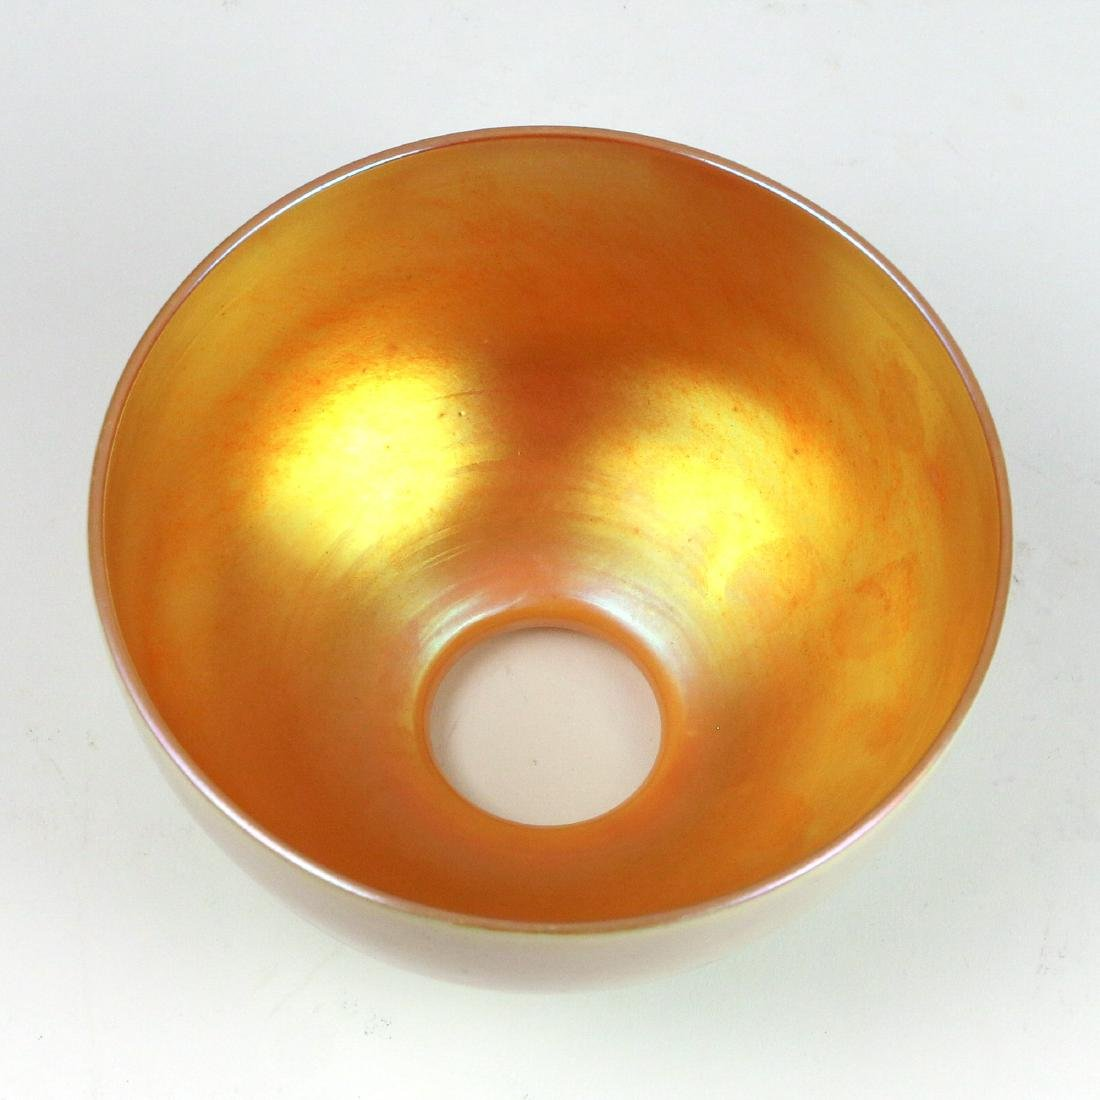 (2pc) STEUBEN SHADE & HAND-BLOWN GLASS PITCHER - 5